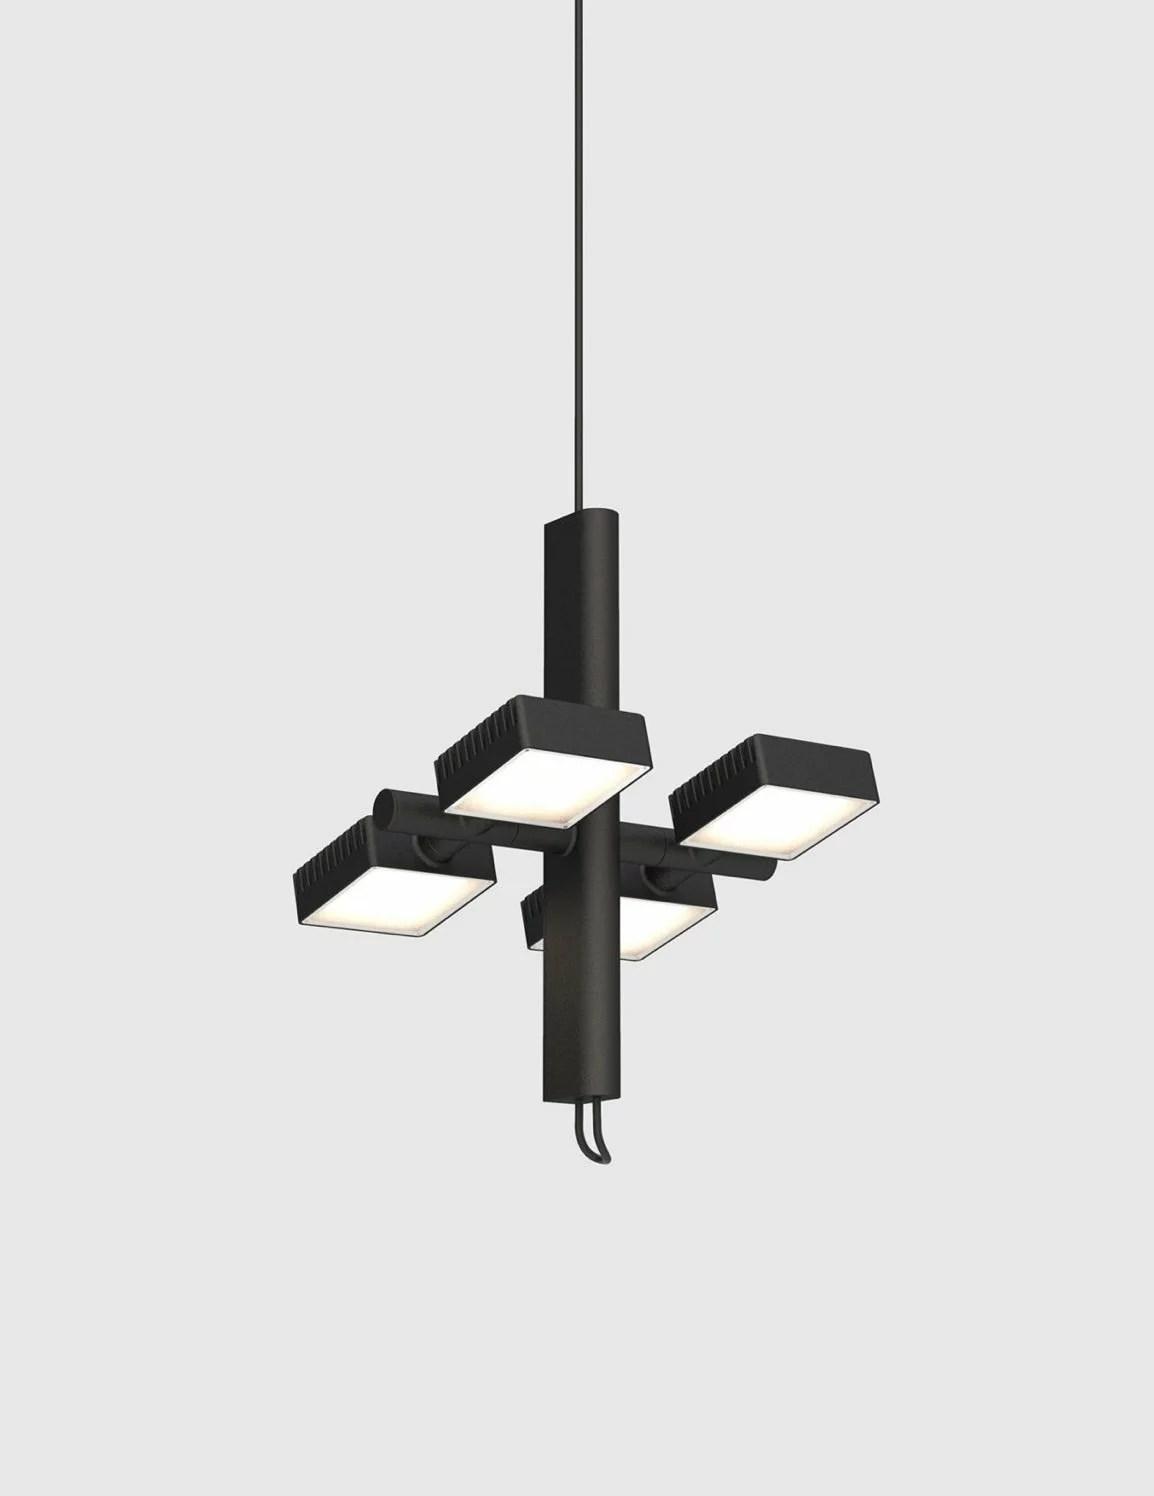 Lambert & Fils, luminaire Dorval 01, design SCMP Design Office